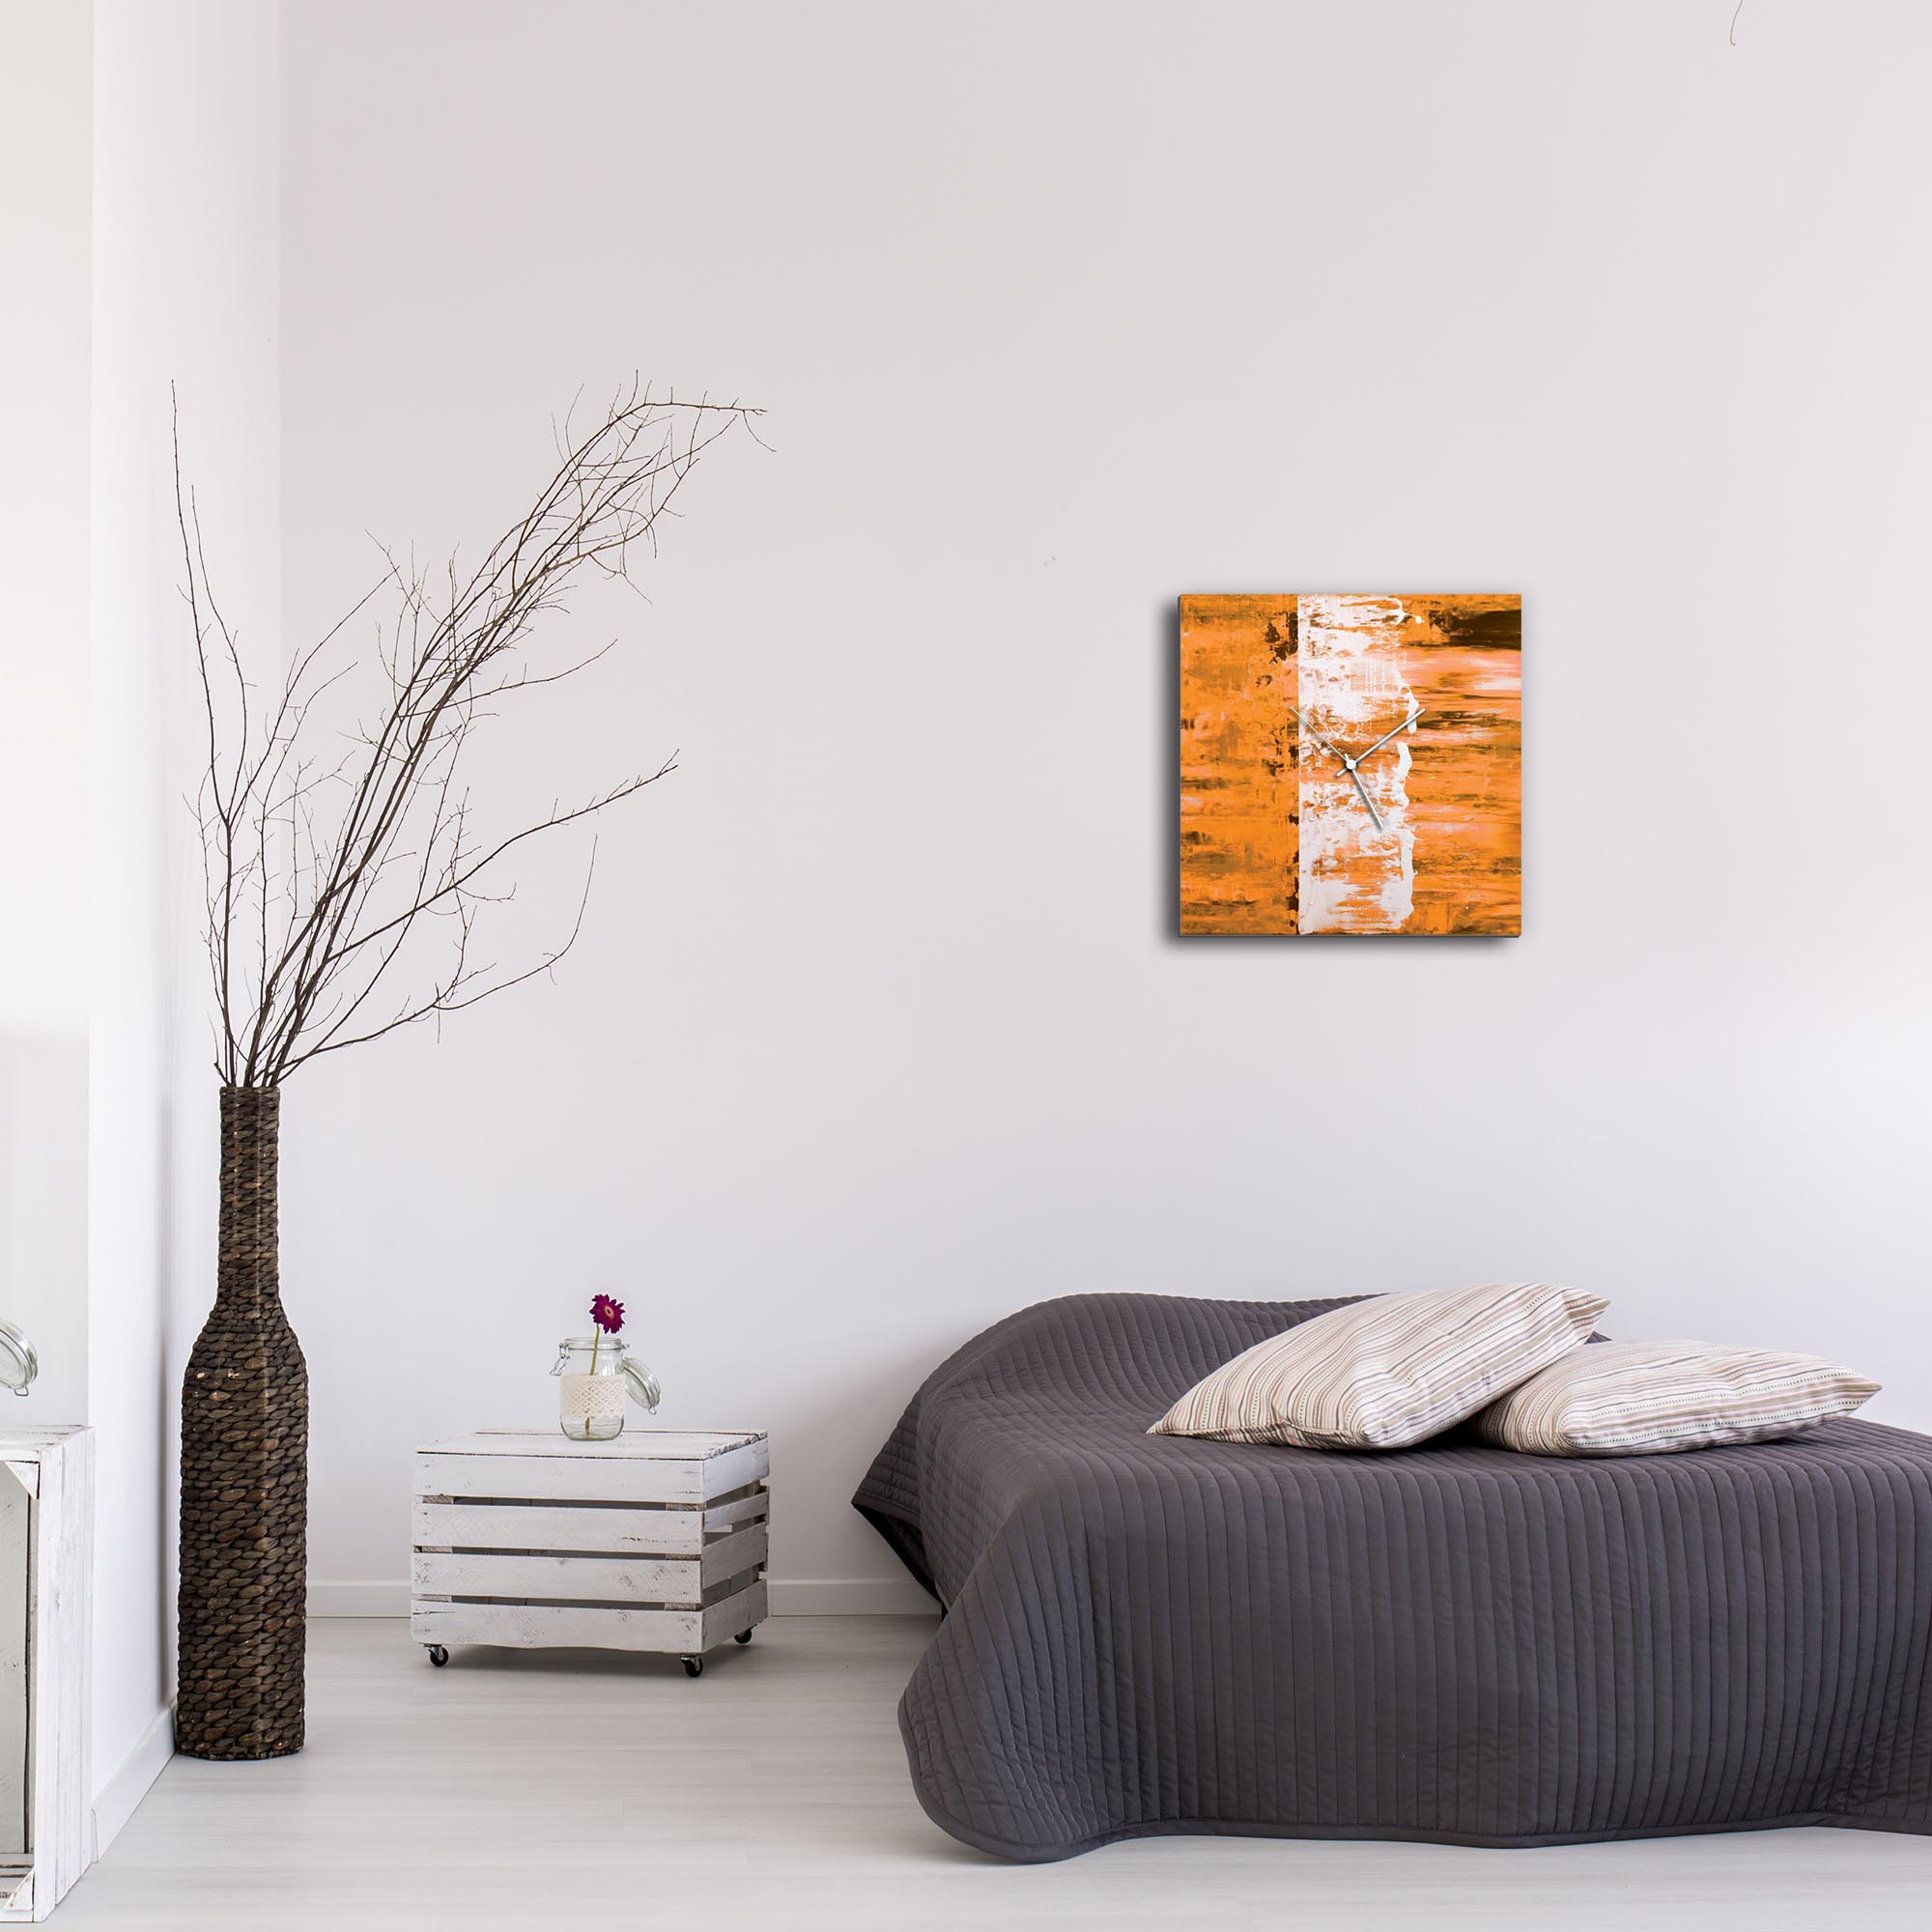 Orange Street Square Clock by Mendo Vasilevski - Urban Abstract Home Decor - Lifestyle View